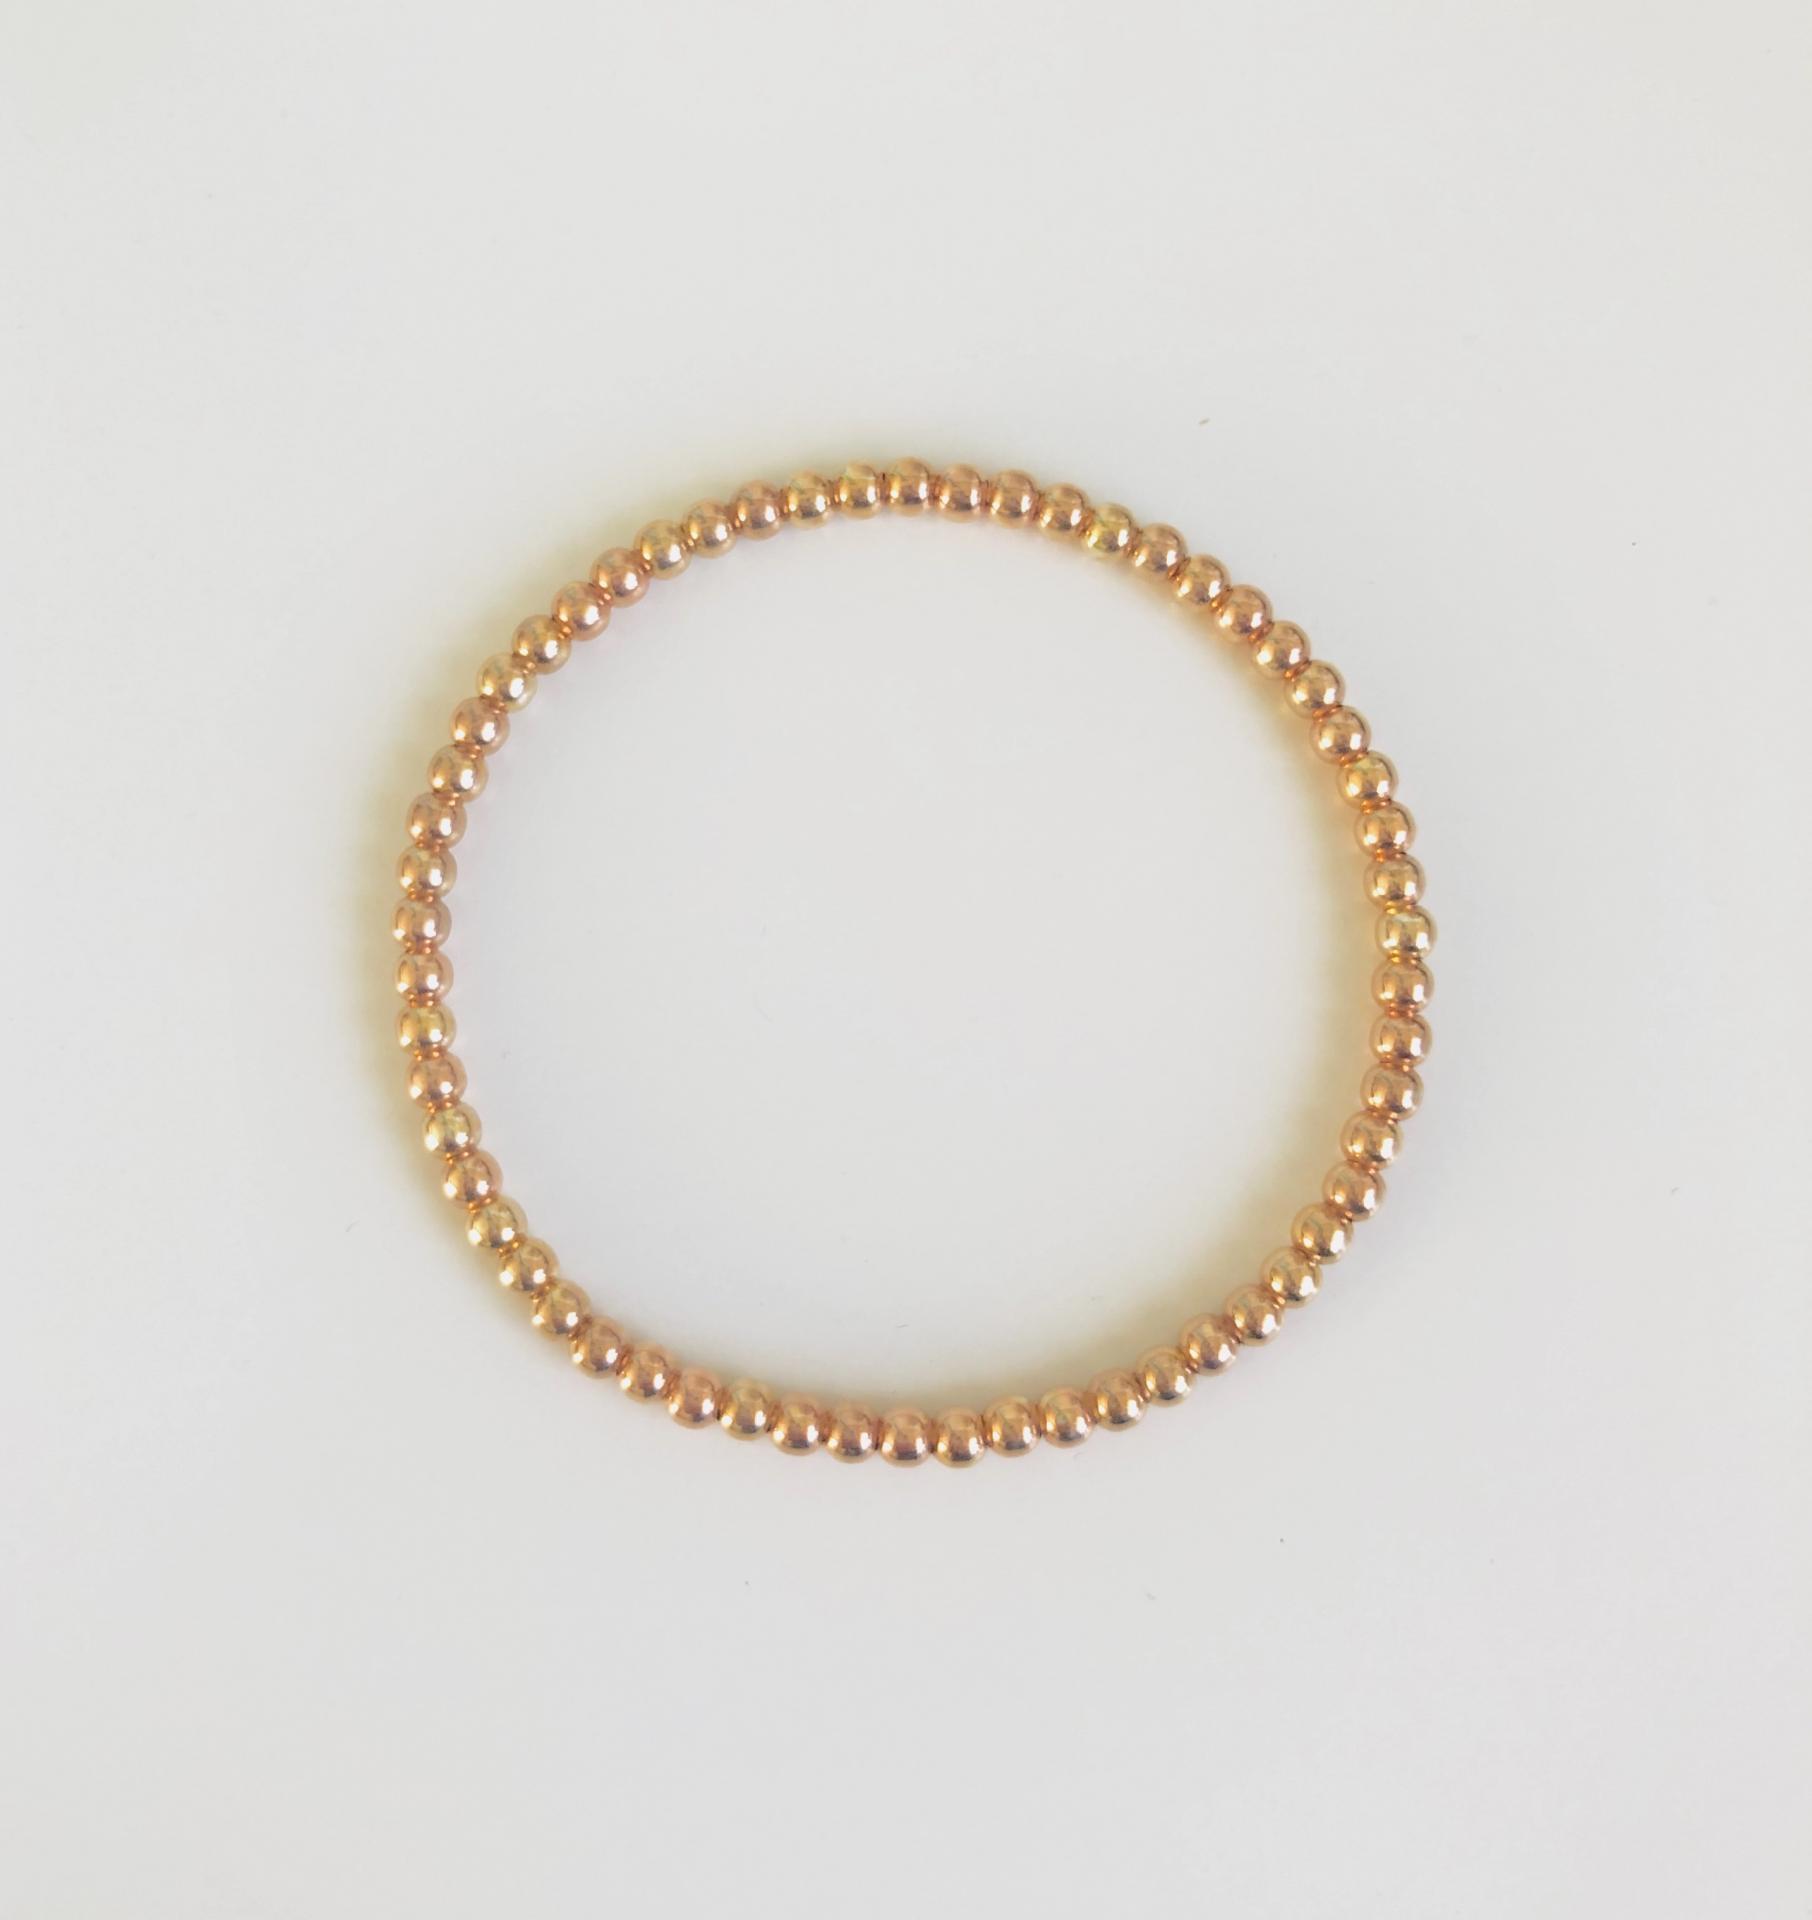 Pulsera elástica de bolas de plata con baño de oro rosa